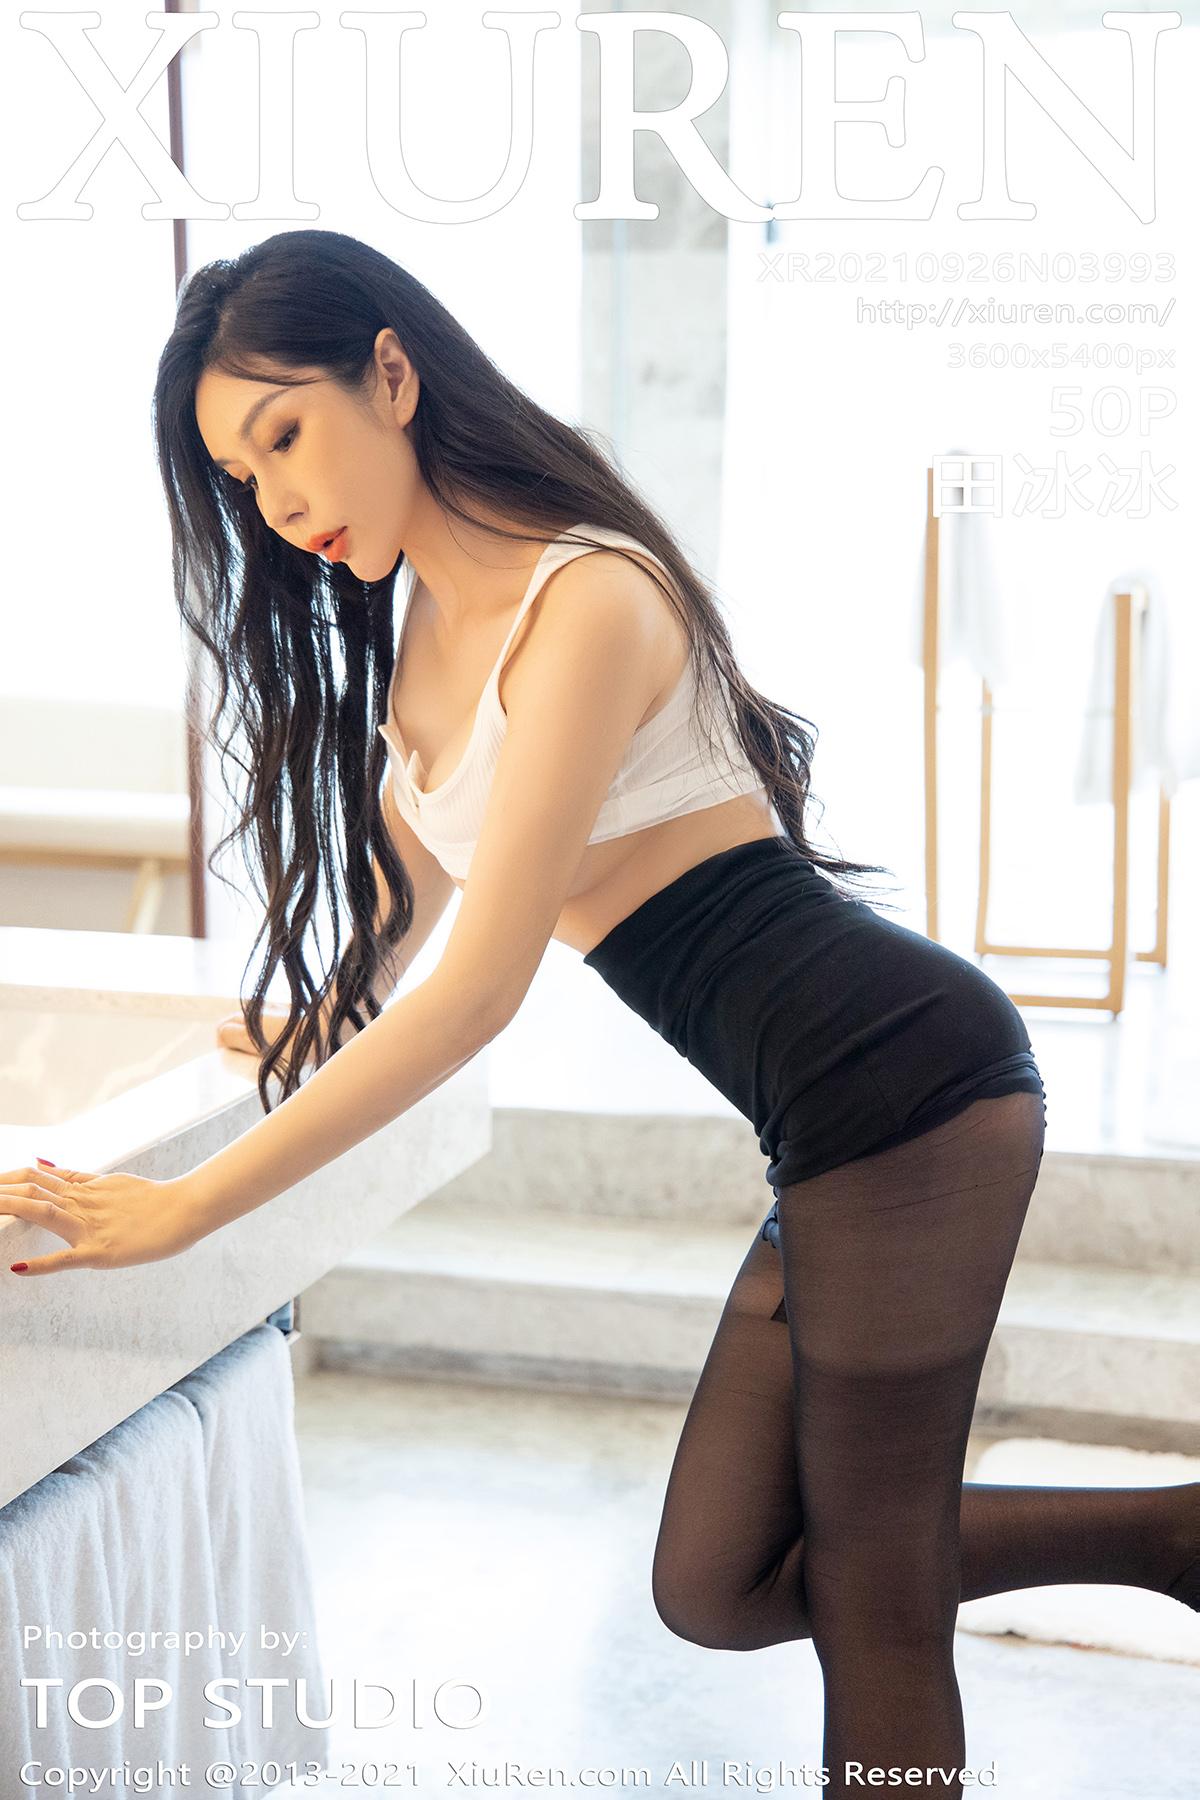 [XiuRen秀人網] 2021.09.26 No.3993 田冰冰 黑白搭配魅惑黑絲系列 [50P] - 貼圖 - 清涼寫真 -